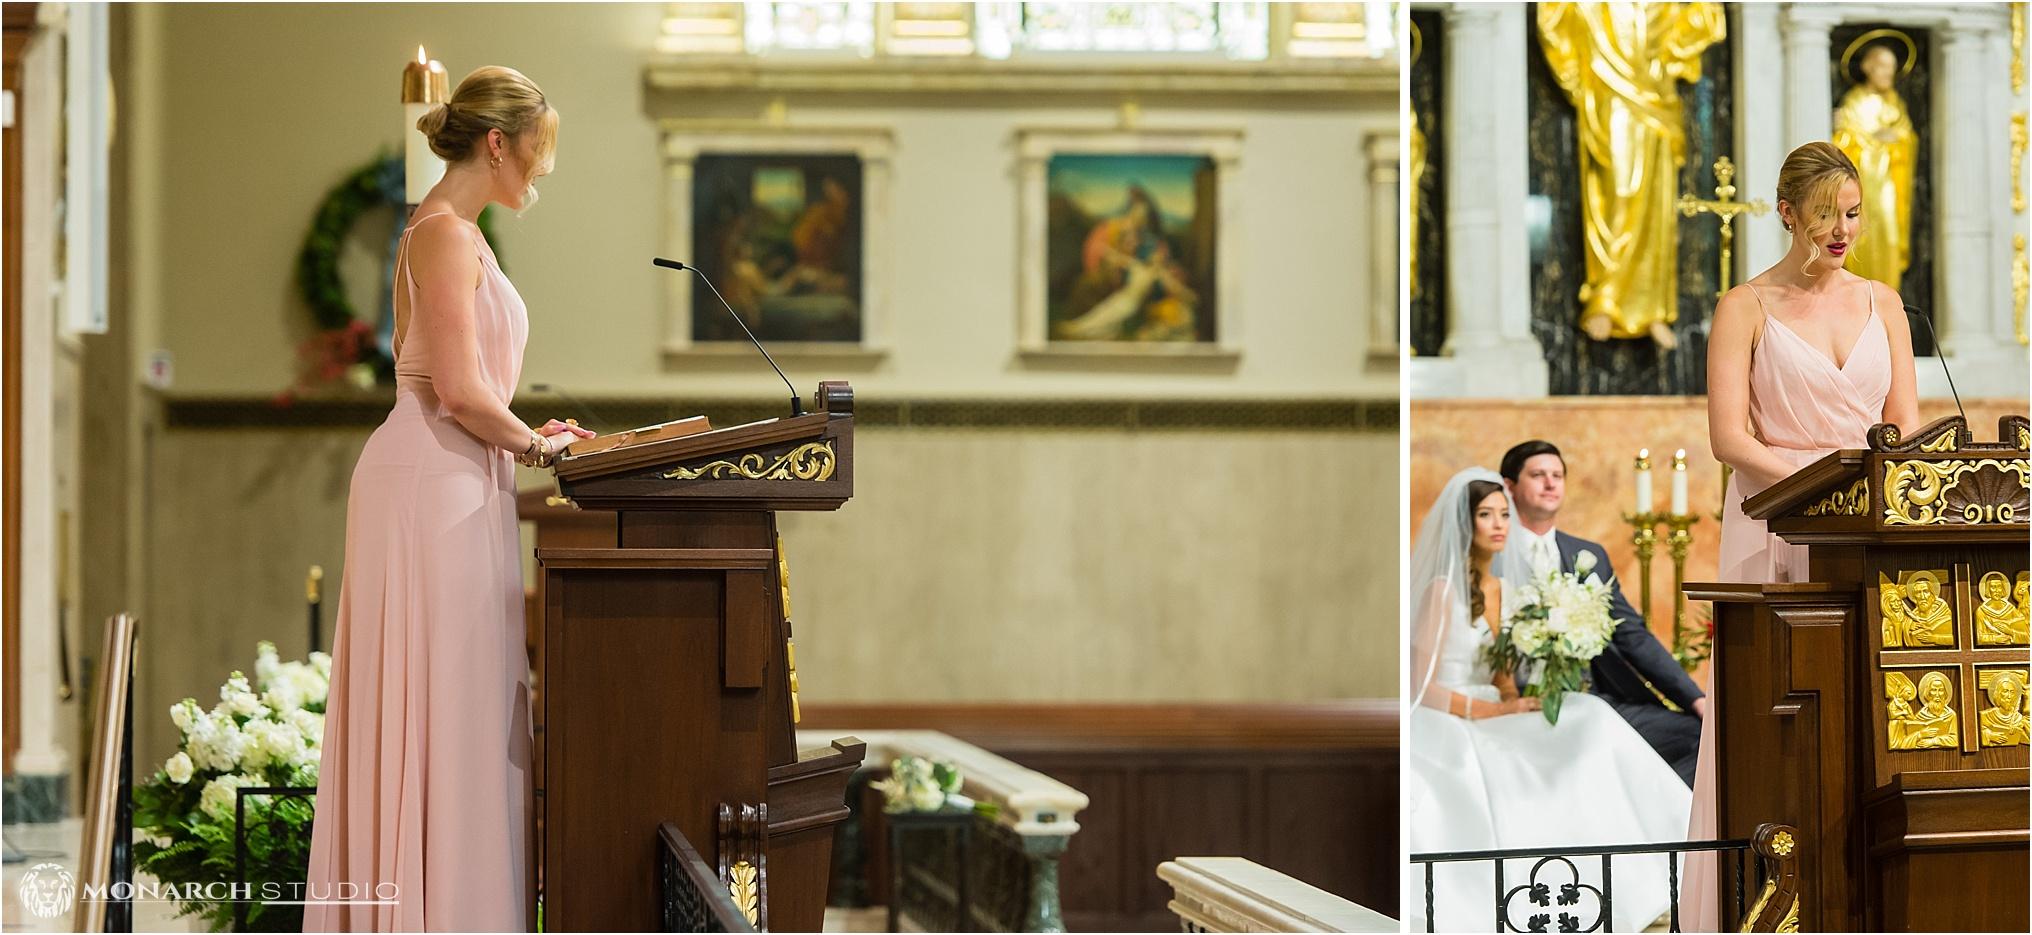 st-augustine-wedding-photographer-061.jpg